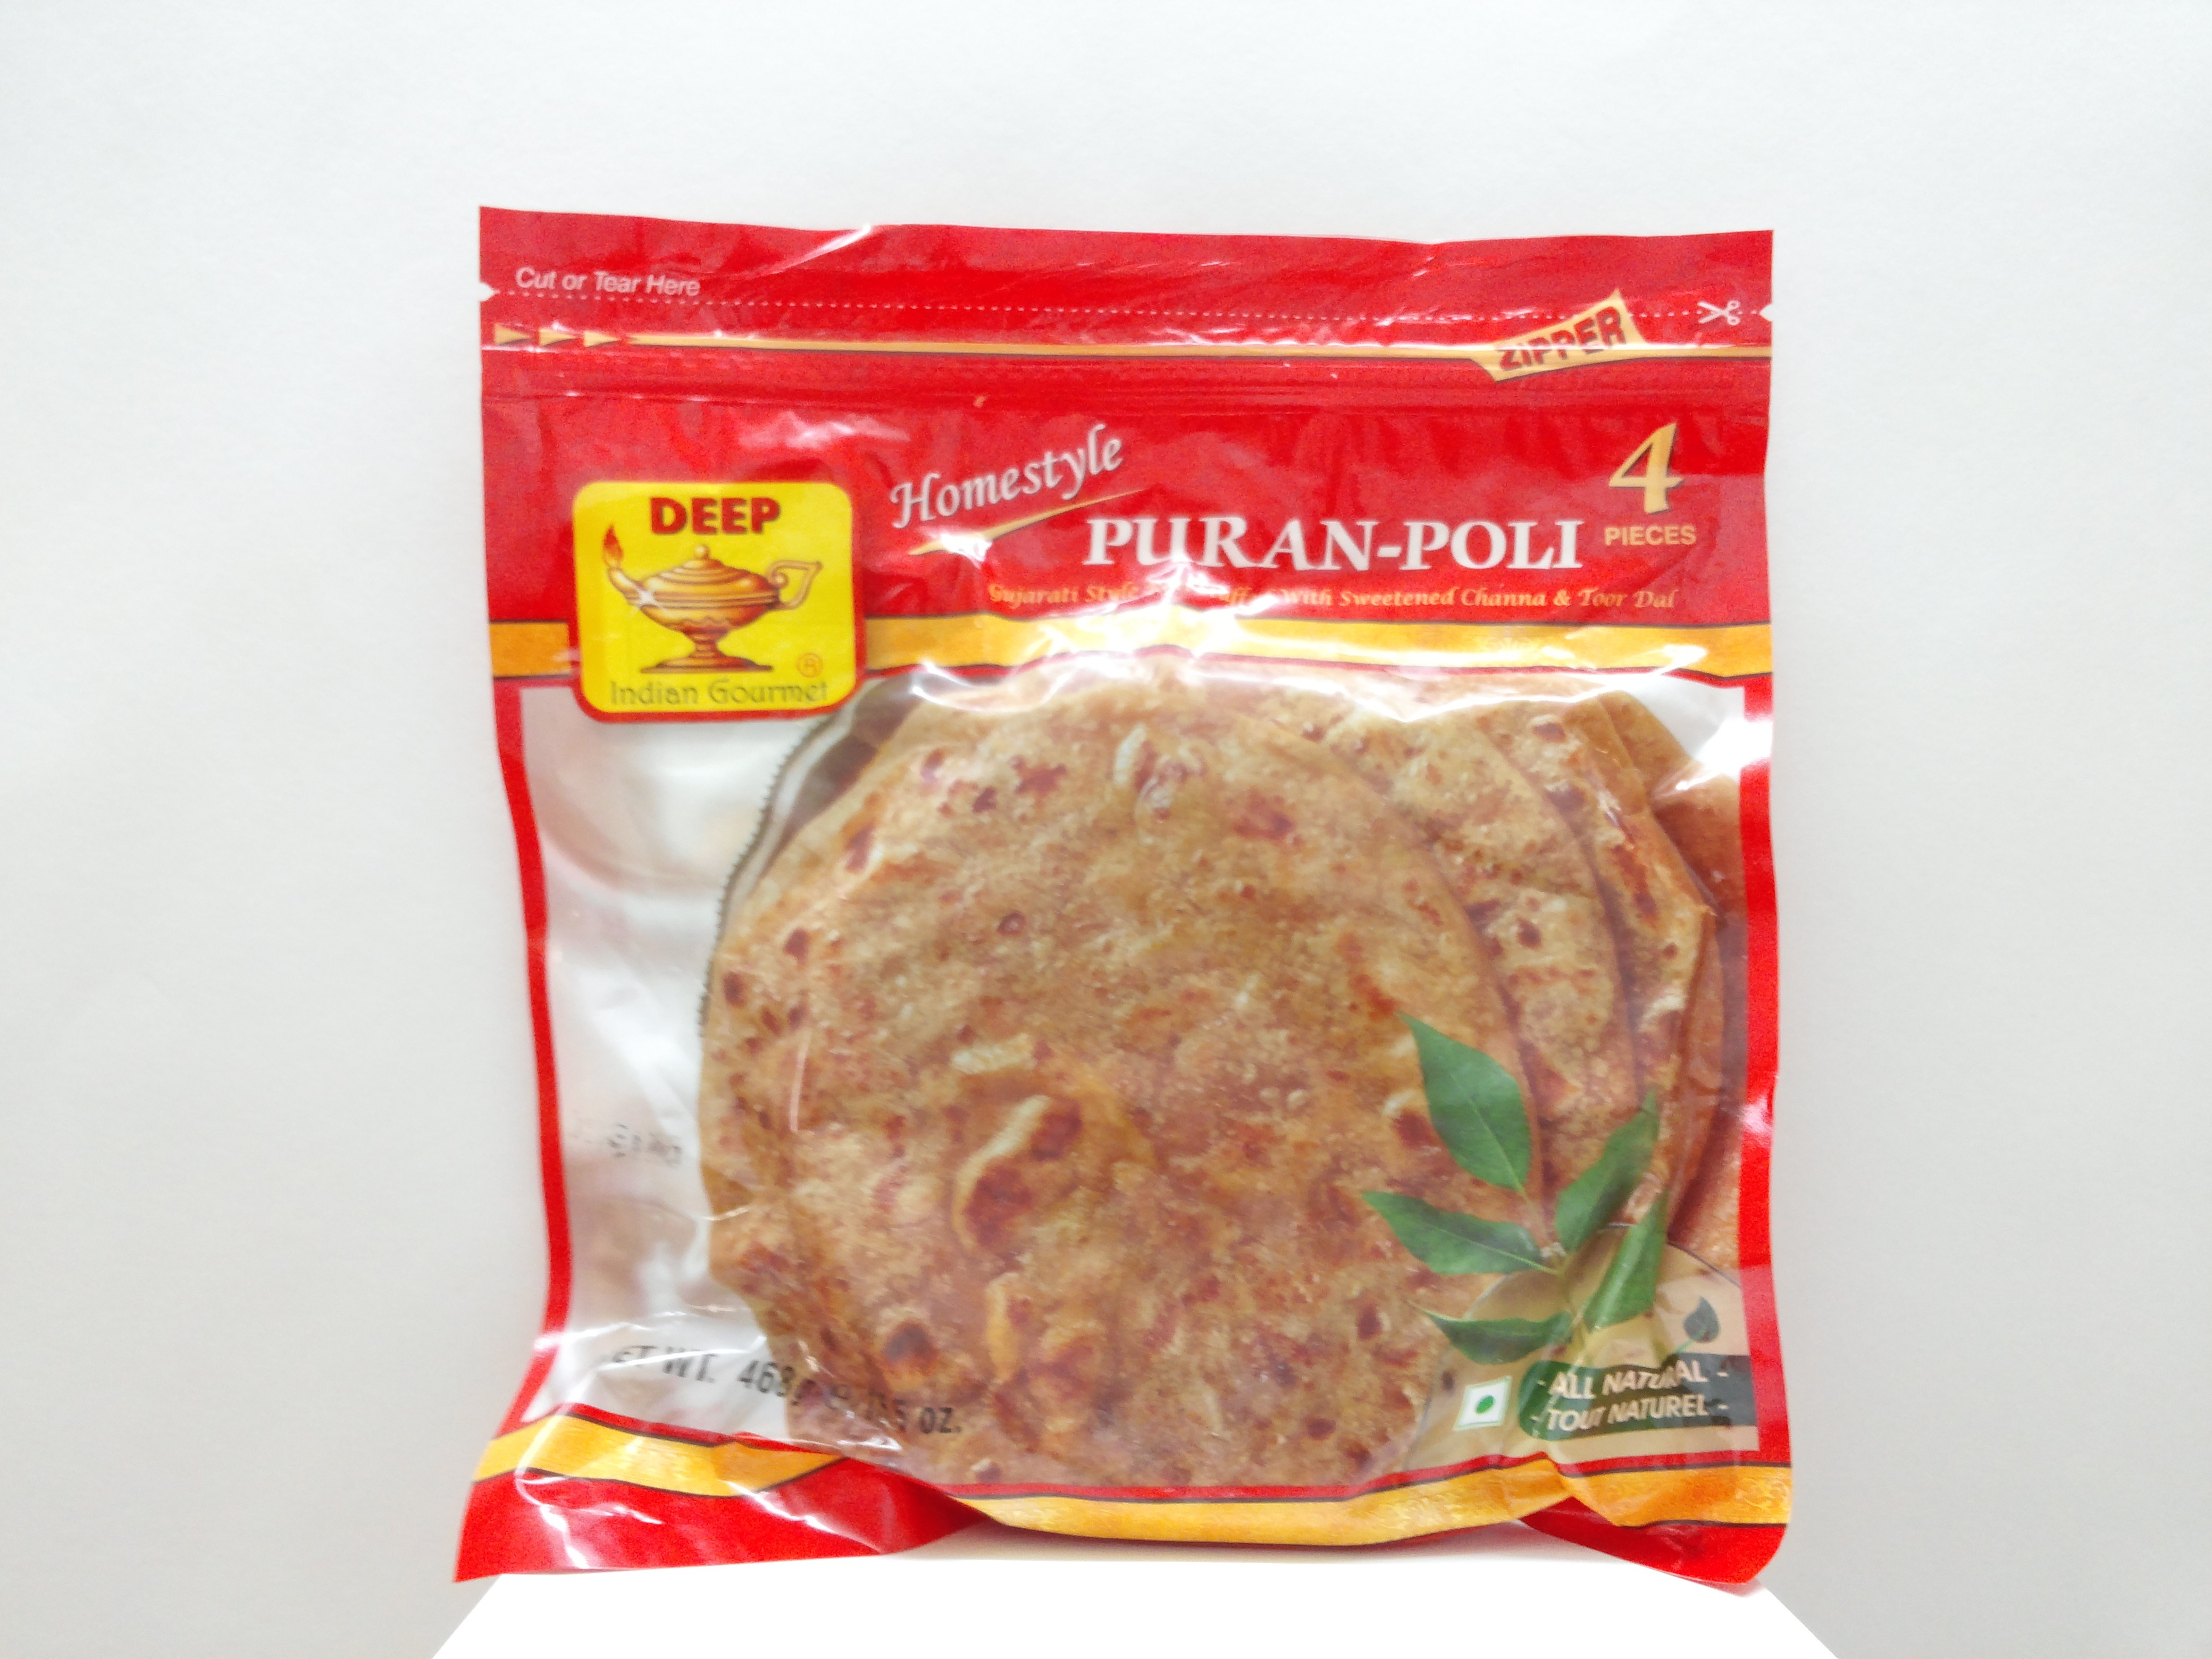 Deep Puran-Poli 4 pcs 16.5 oz